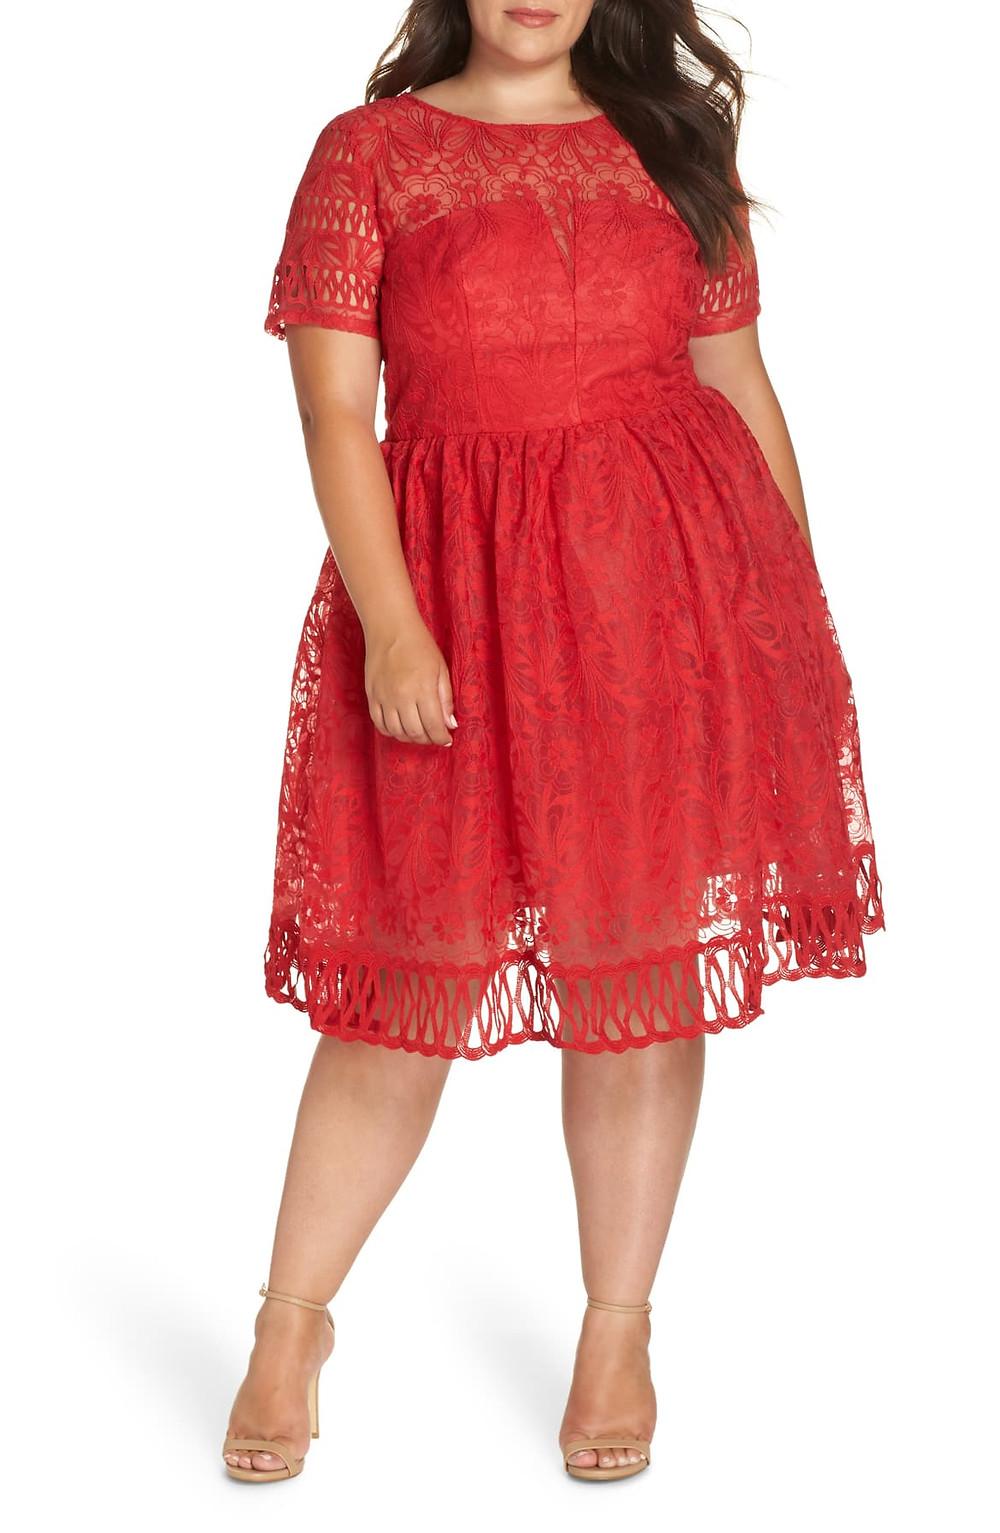 Chi Chi London Red Crochet Dress